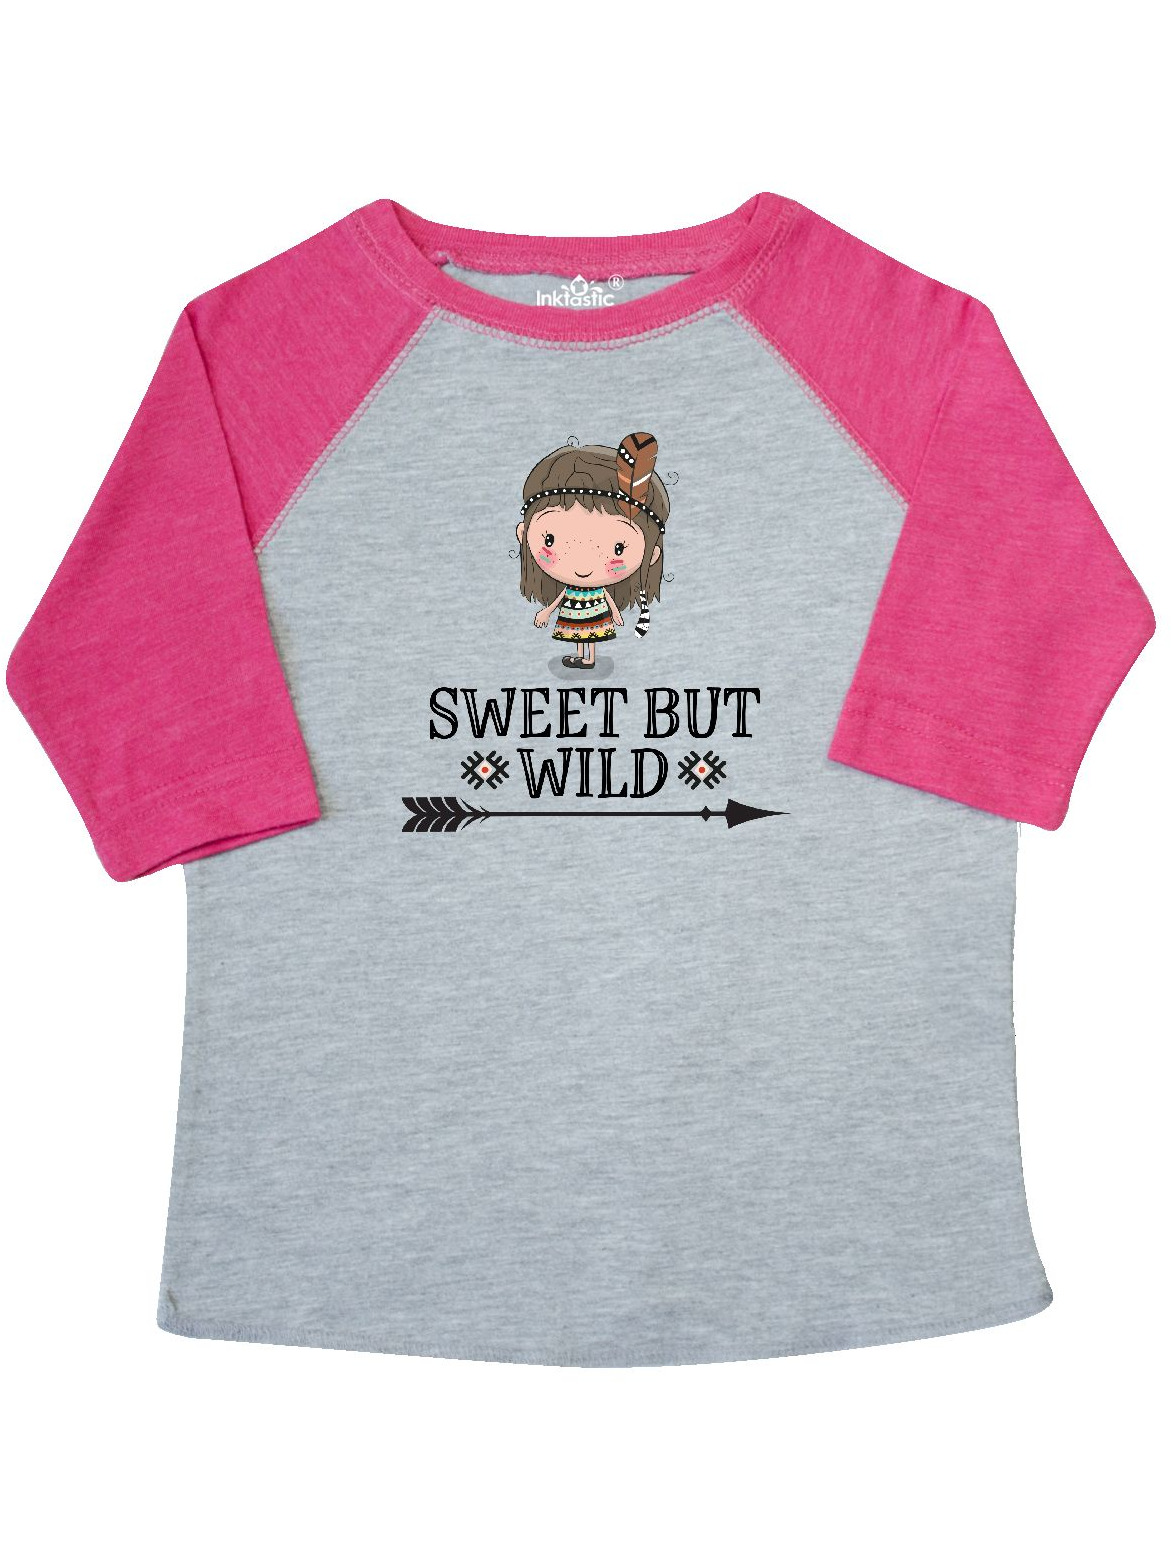 inktastic Tribal Arrow Native Themed Girl Toddler T-Shirt